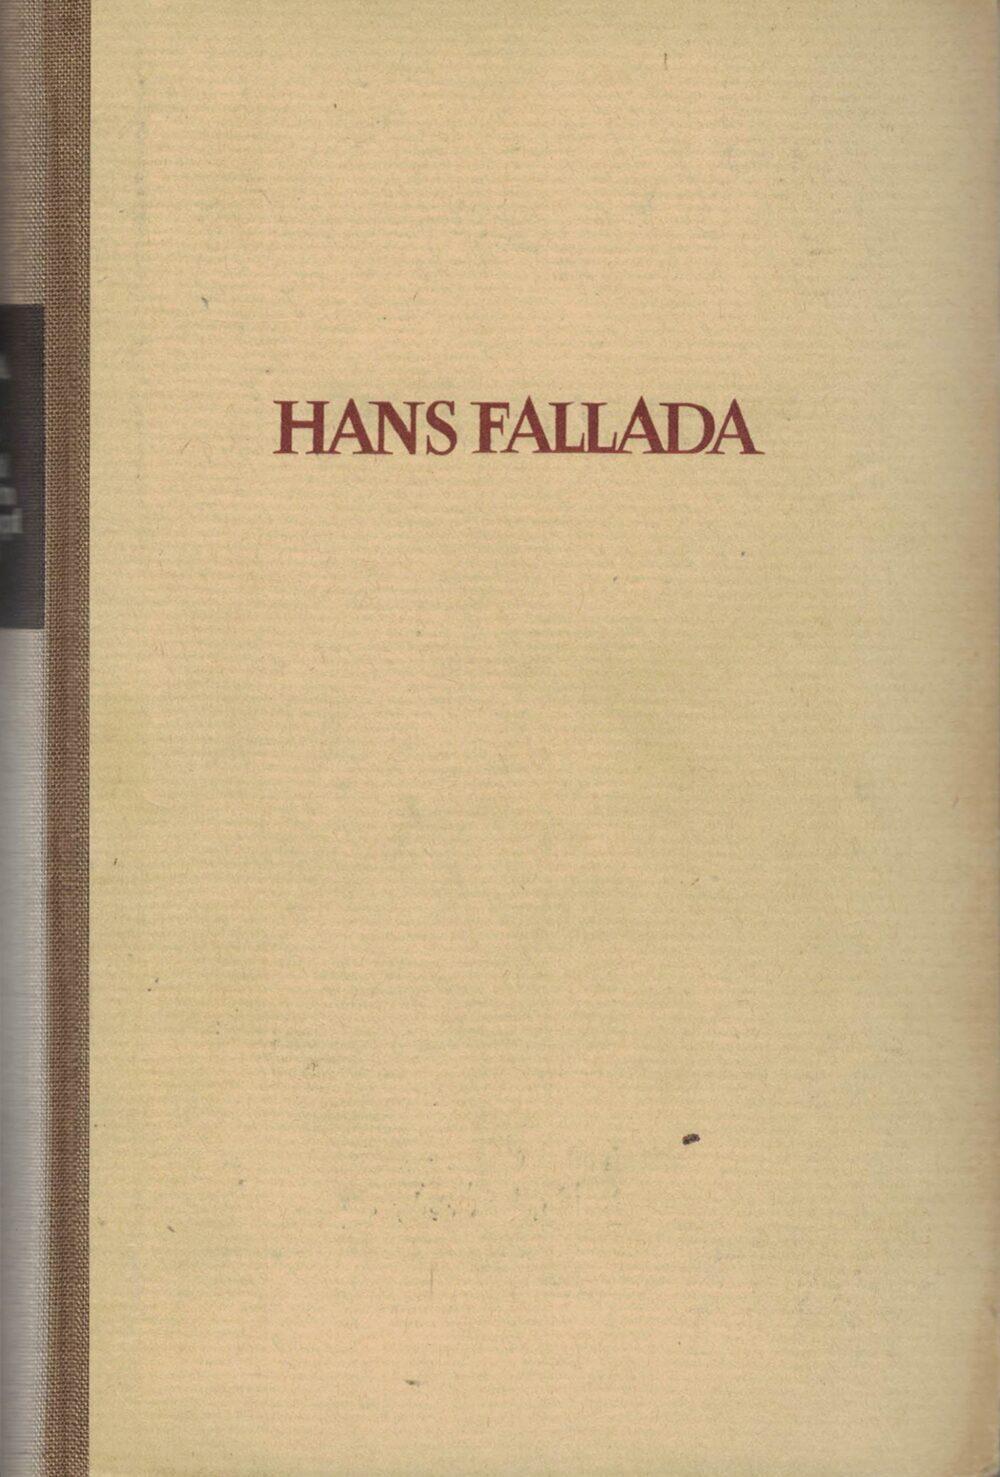 Hans Fallada - Wer einmal aus dem Blechnapf frist - Roman